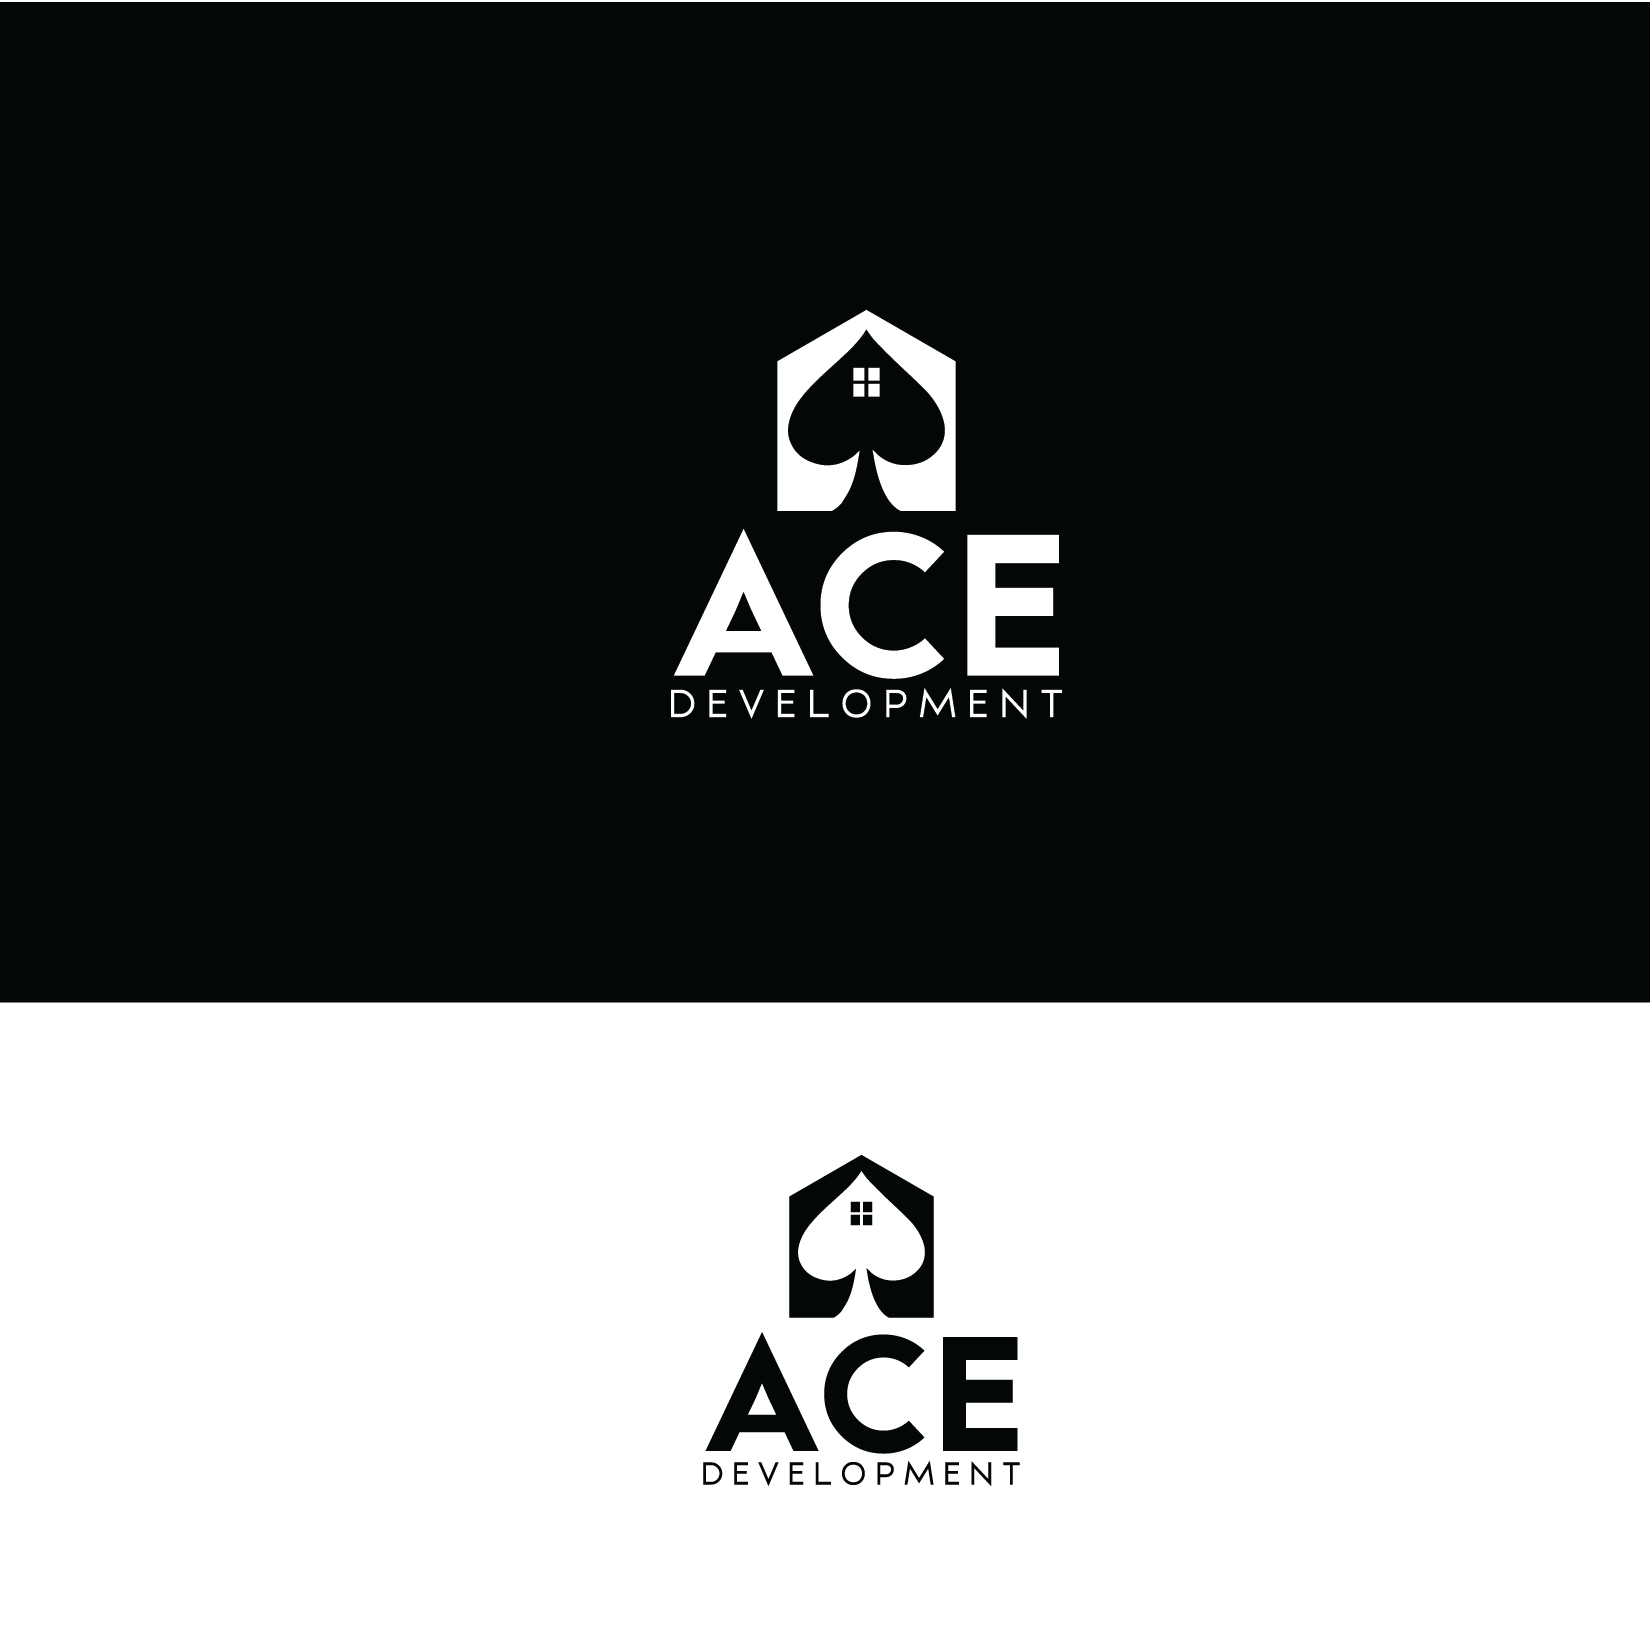 Logo Design by Private User - Entry No. 107 in the Logo Design Contest Fun Logo Design for Ace development.